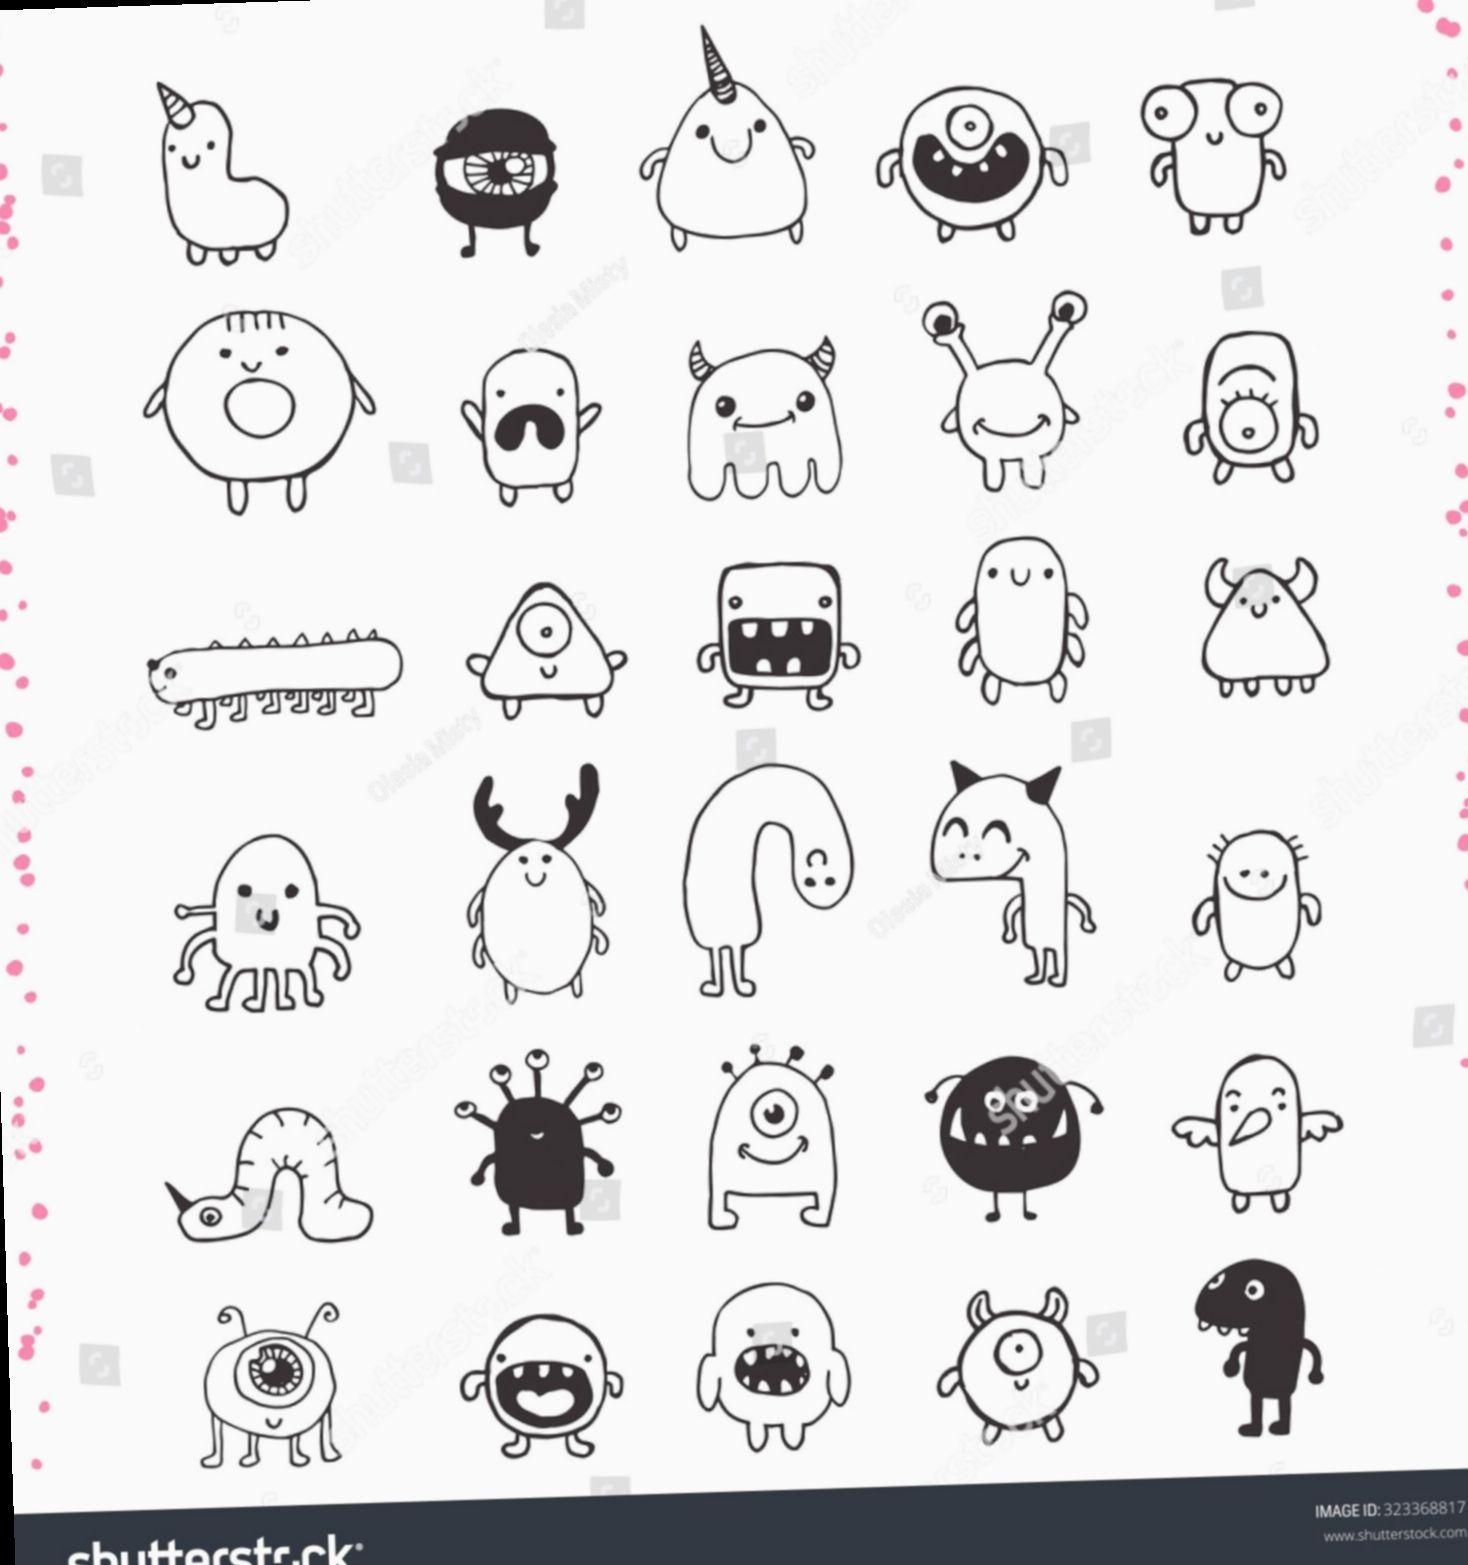 Anime Sketch Pencil Hand Drawn Bokunoheroacademiacosplay